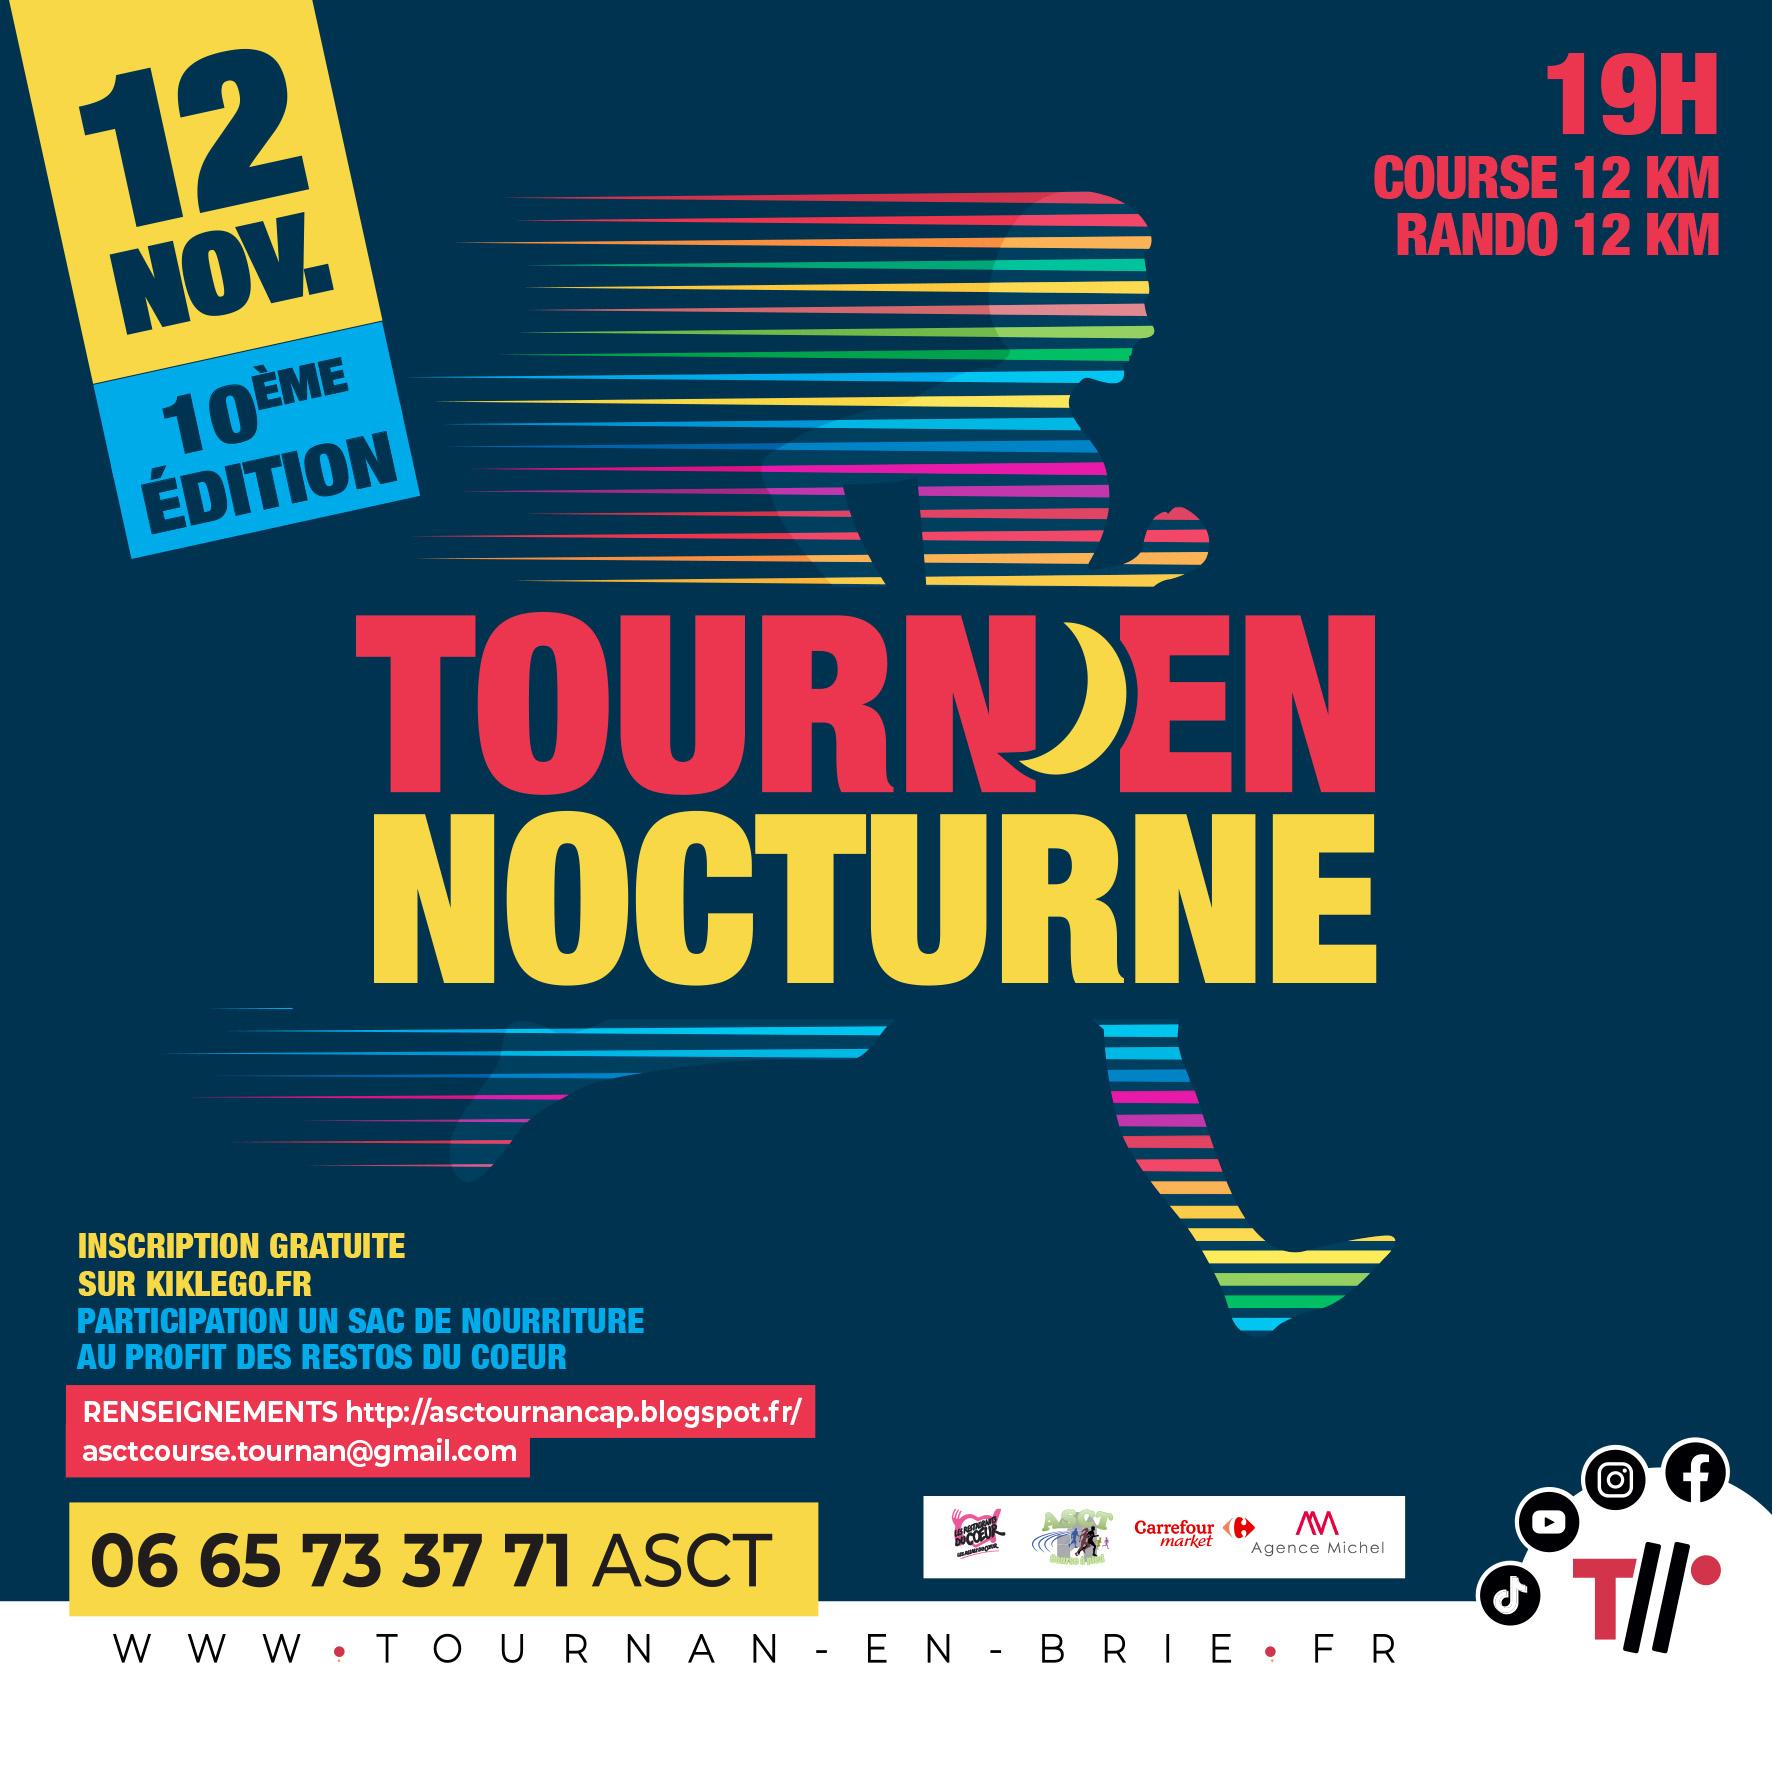 TOURN'EN NOCTURNE